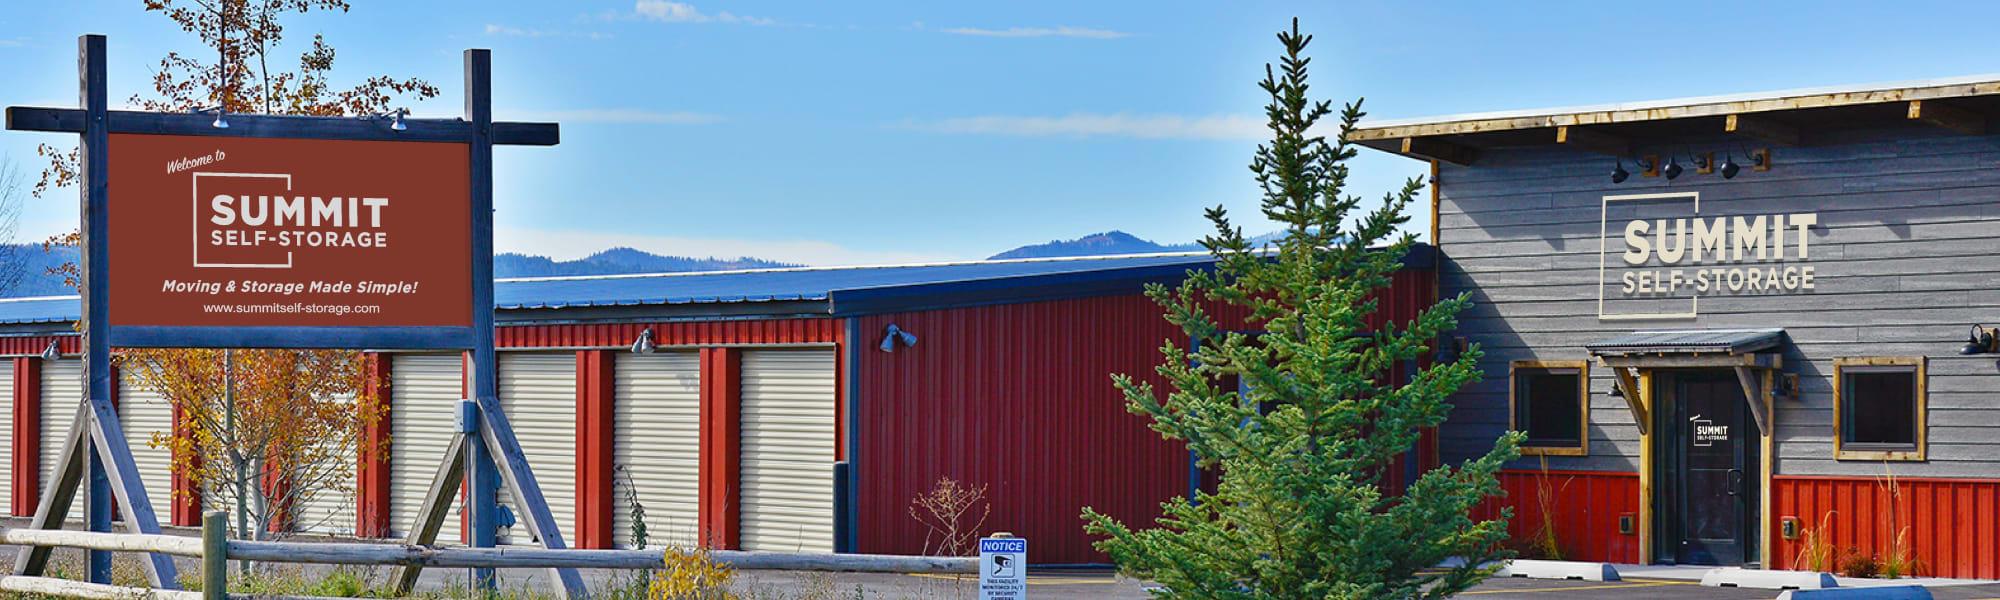 Summit Self-Storage in Victor, Idaho